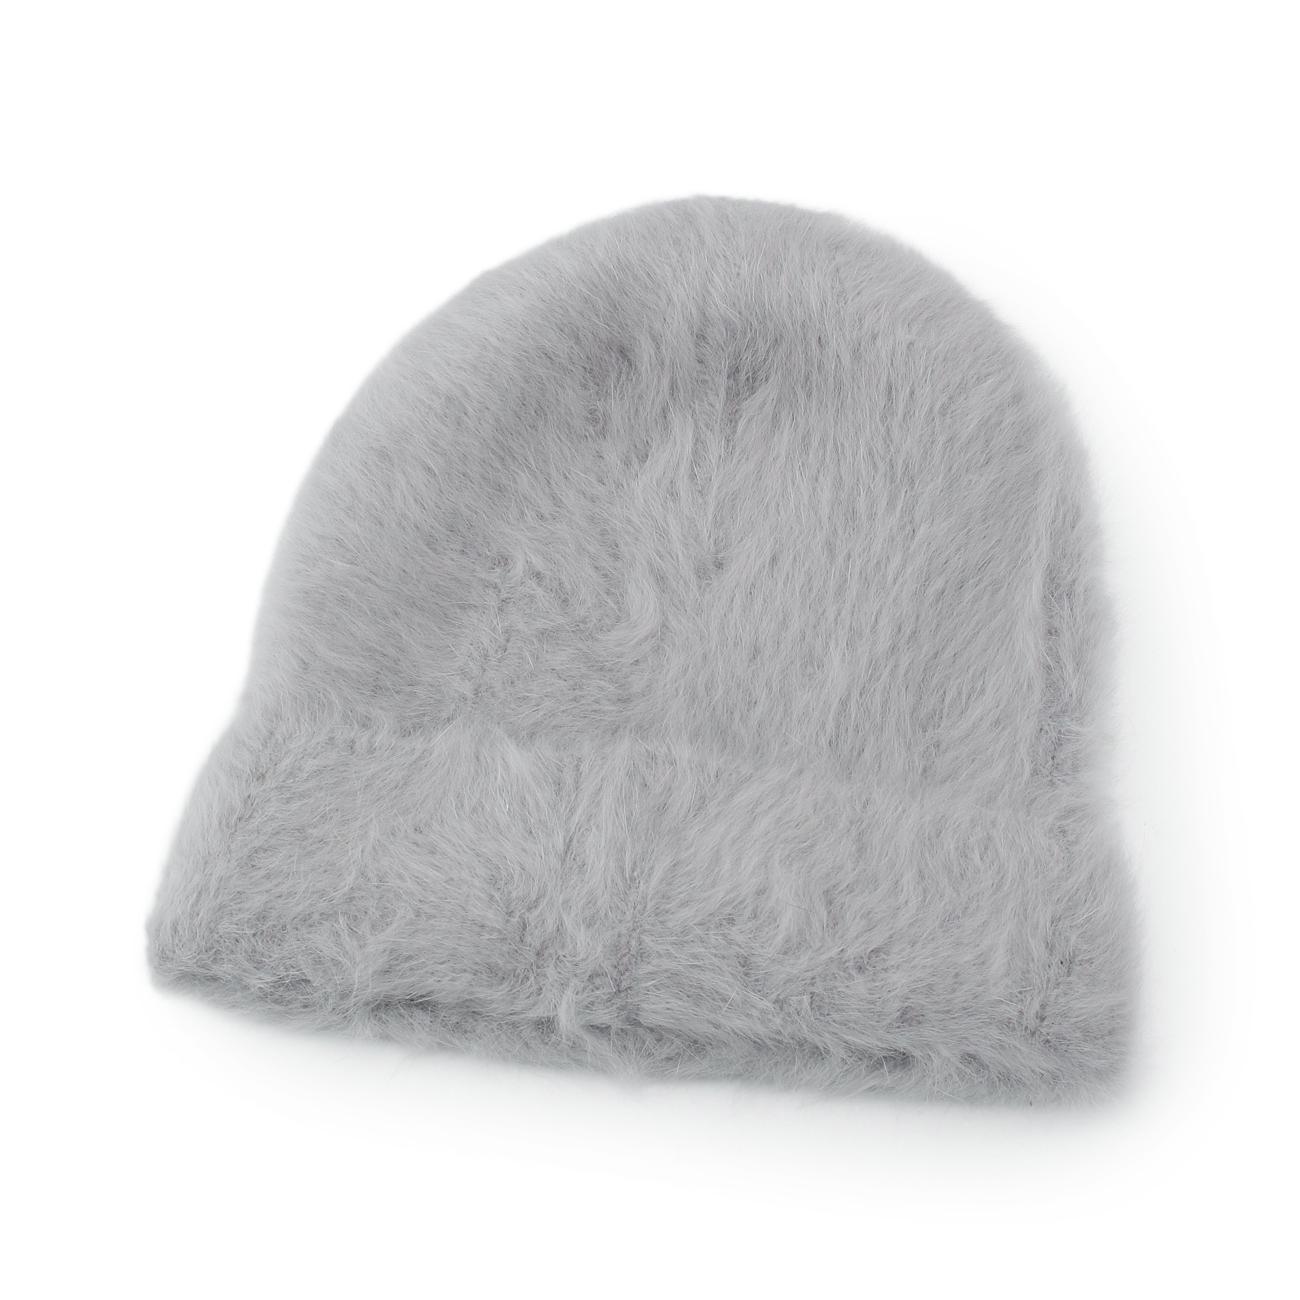 【OPAQUE.CLIP (オペークドットクリップ)】シャギーニットワッチレディース 帽子 ニットキャップ・ビーニー グレー